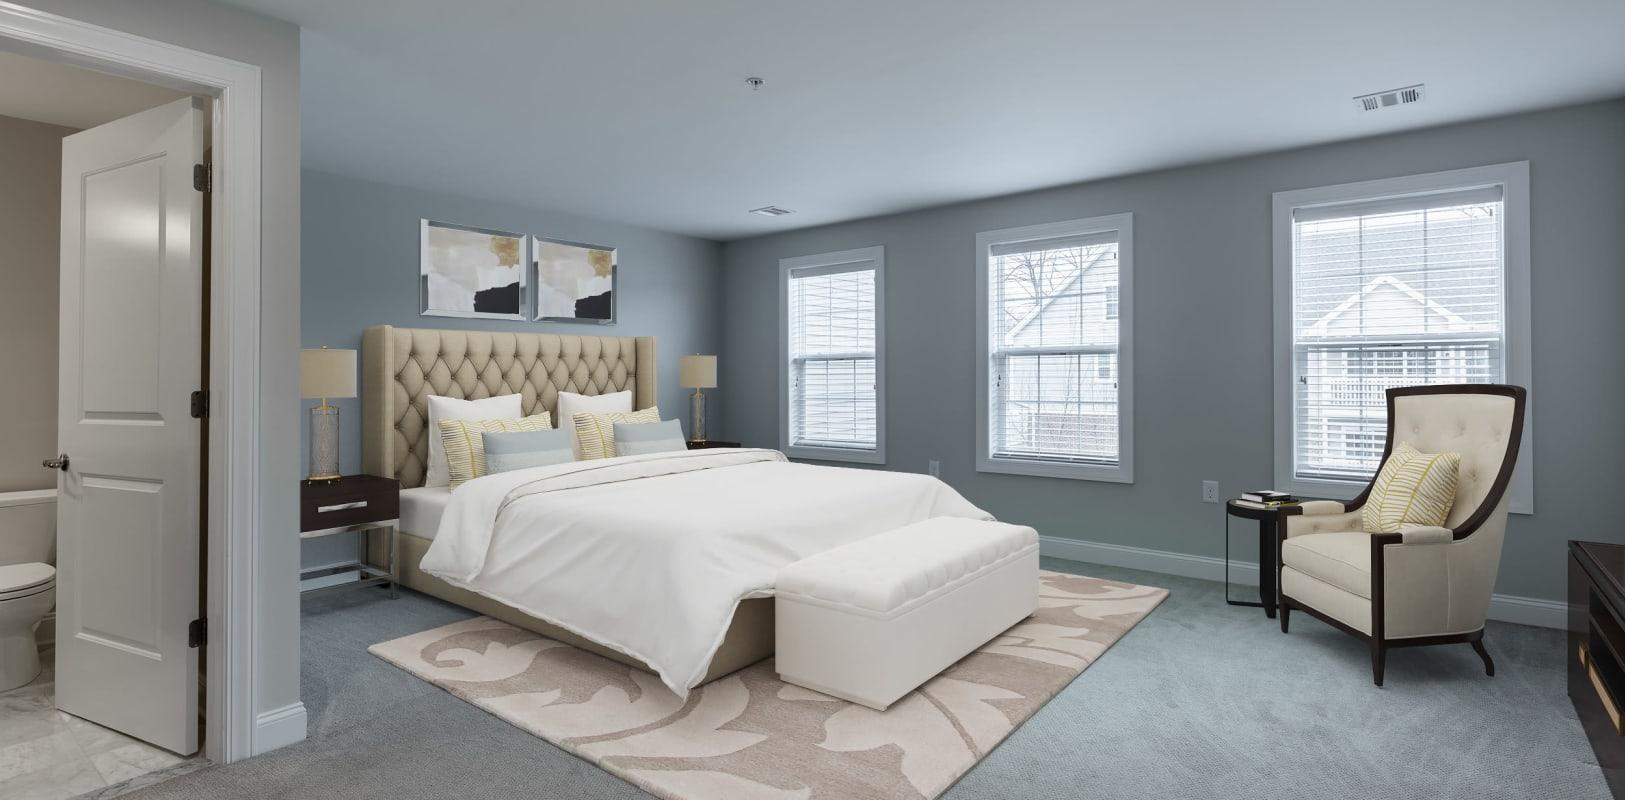 Model bedroom with lots of windows for light at Zephyr Ridge in Cedar Grove, New Jersey